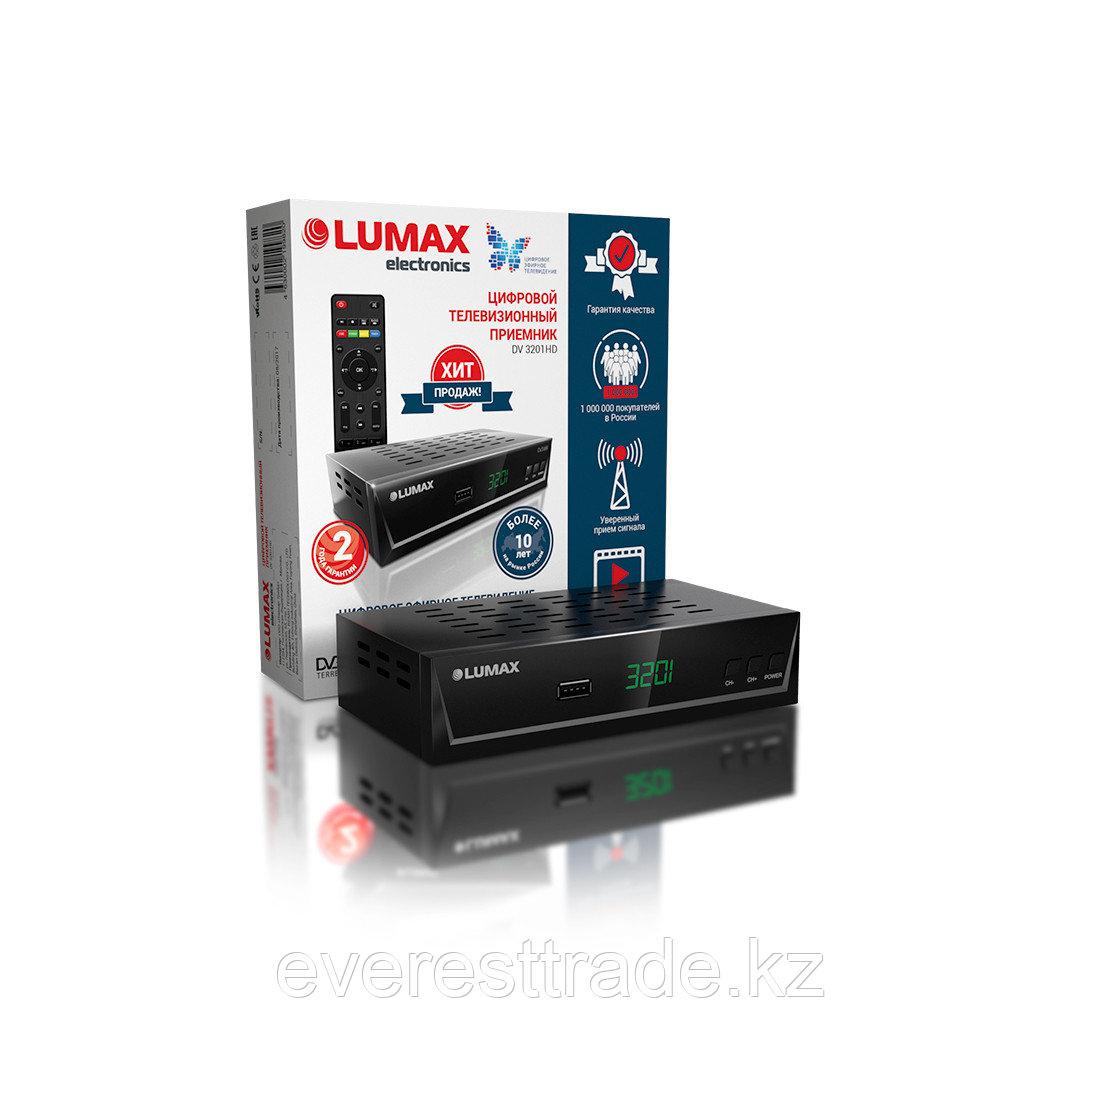 LUMAX Цифровой телевизионный приемник LUMAX DV3201HD Металл